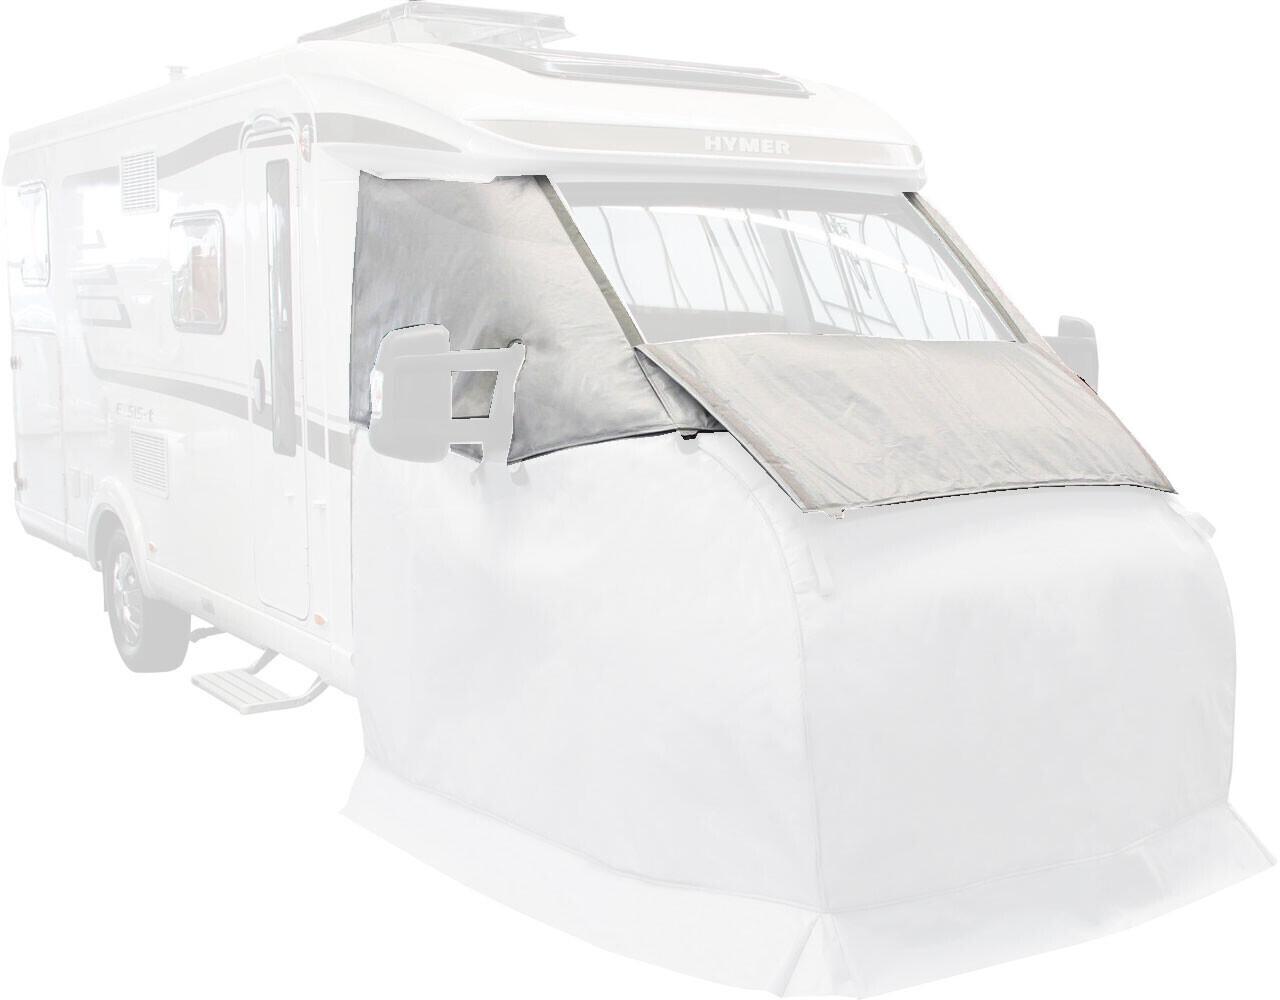 Hindermann LUX-DUO X 250